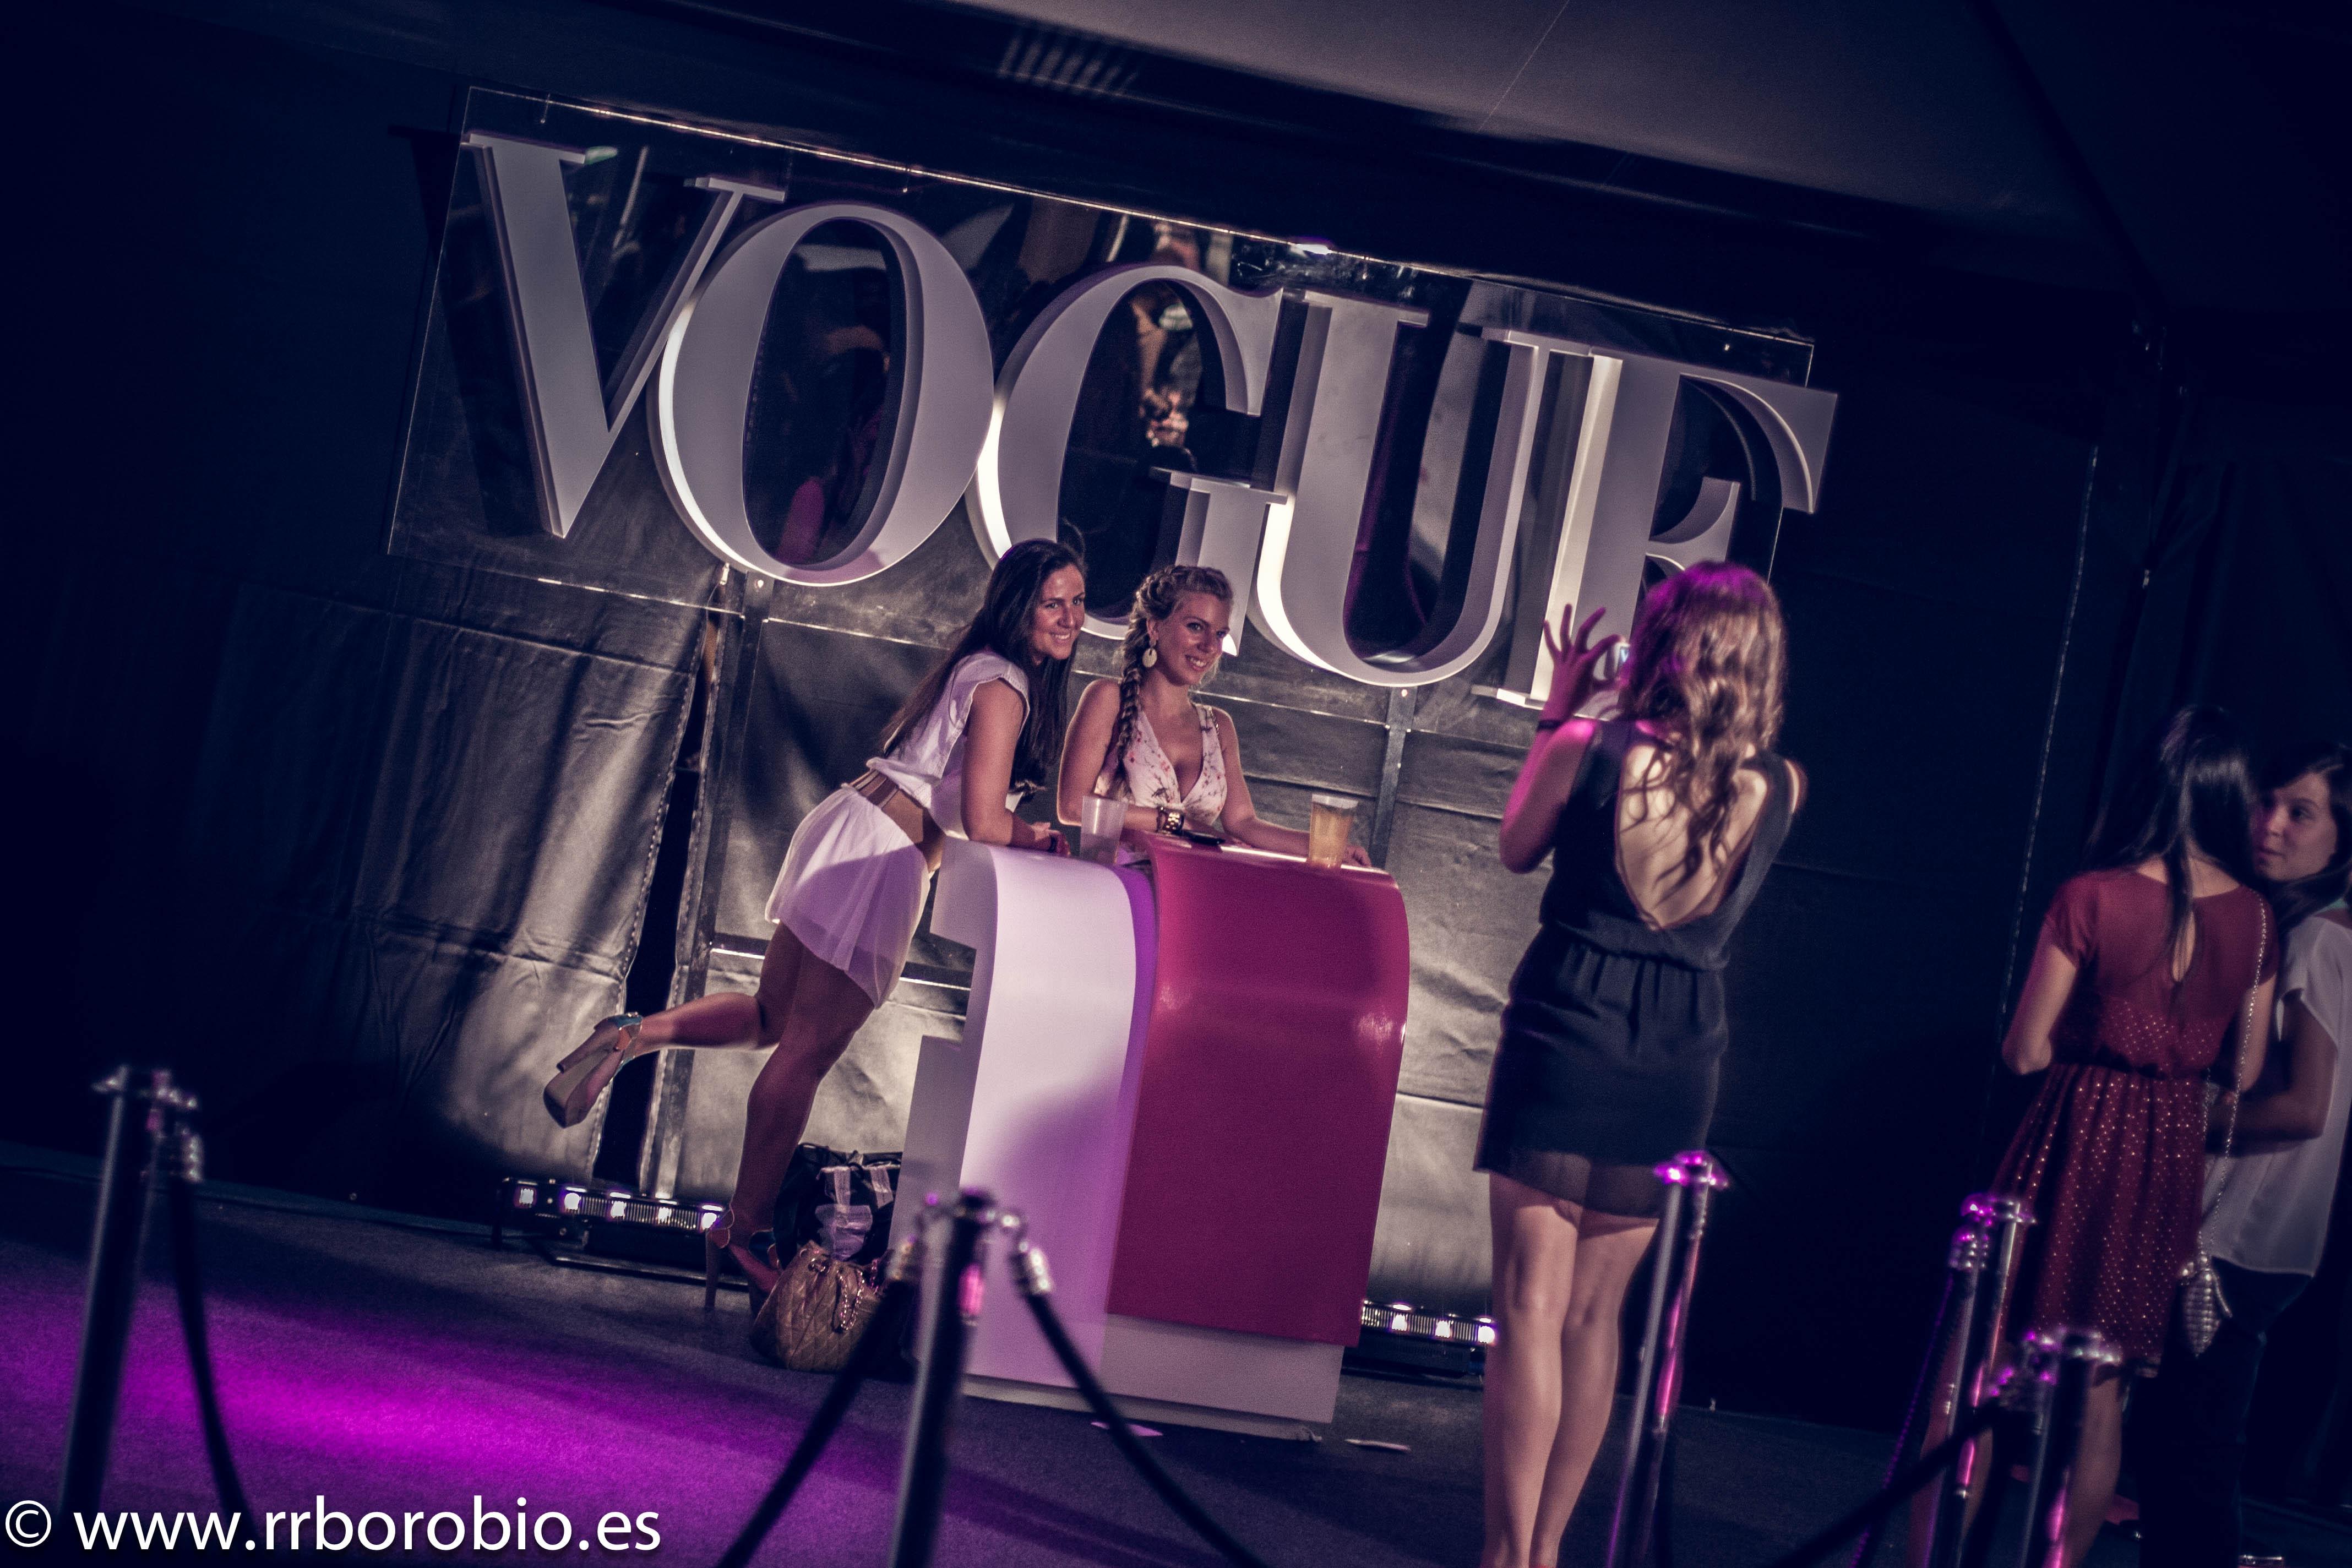 vfno2013 - VFNO MADRID 2013